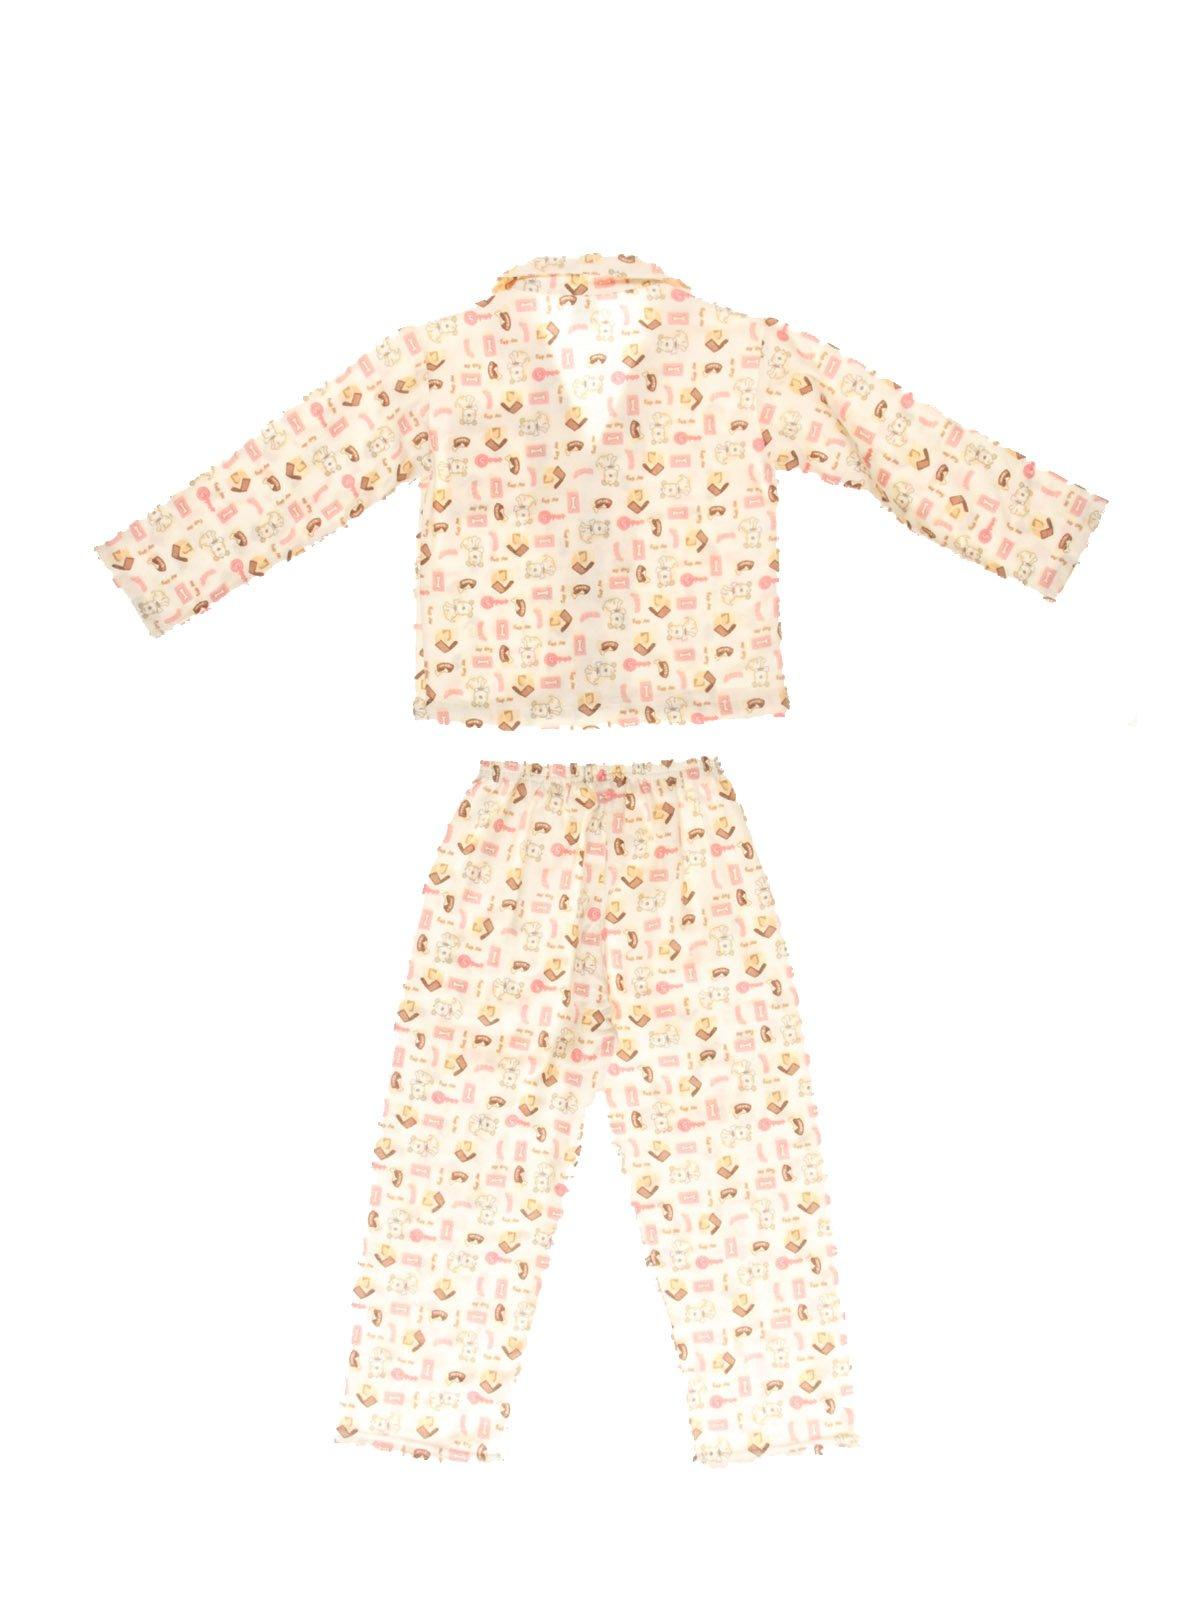 Піжама фланелева з начосом: кофта та штани | 3783111 | фото 2